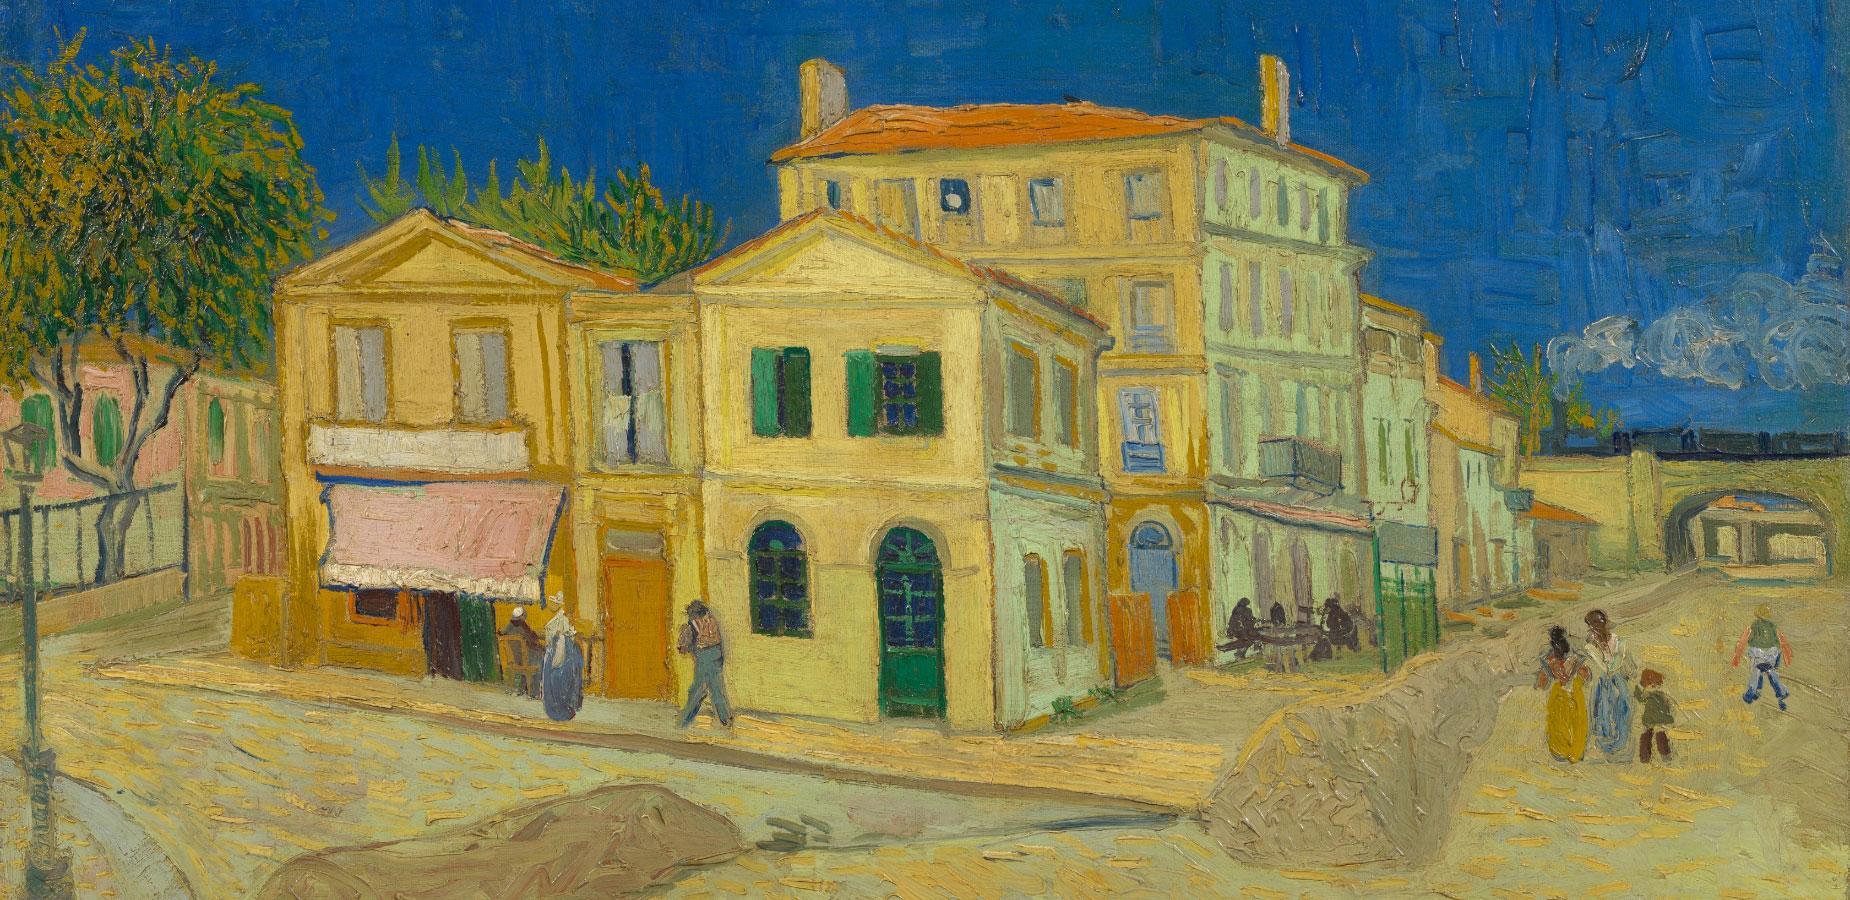 La casa gialla di Van Gogh The Yellow House (The Street)